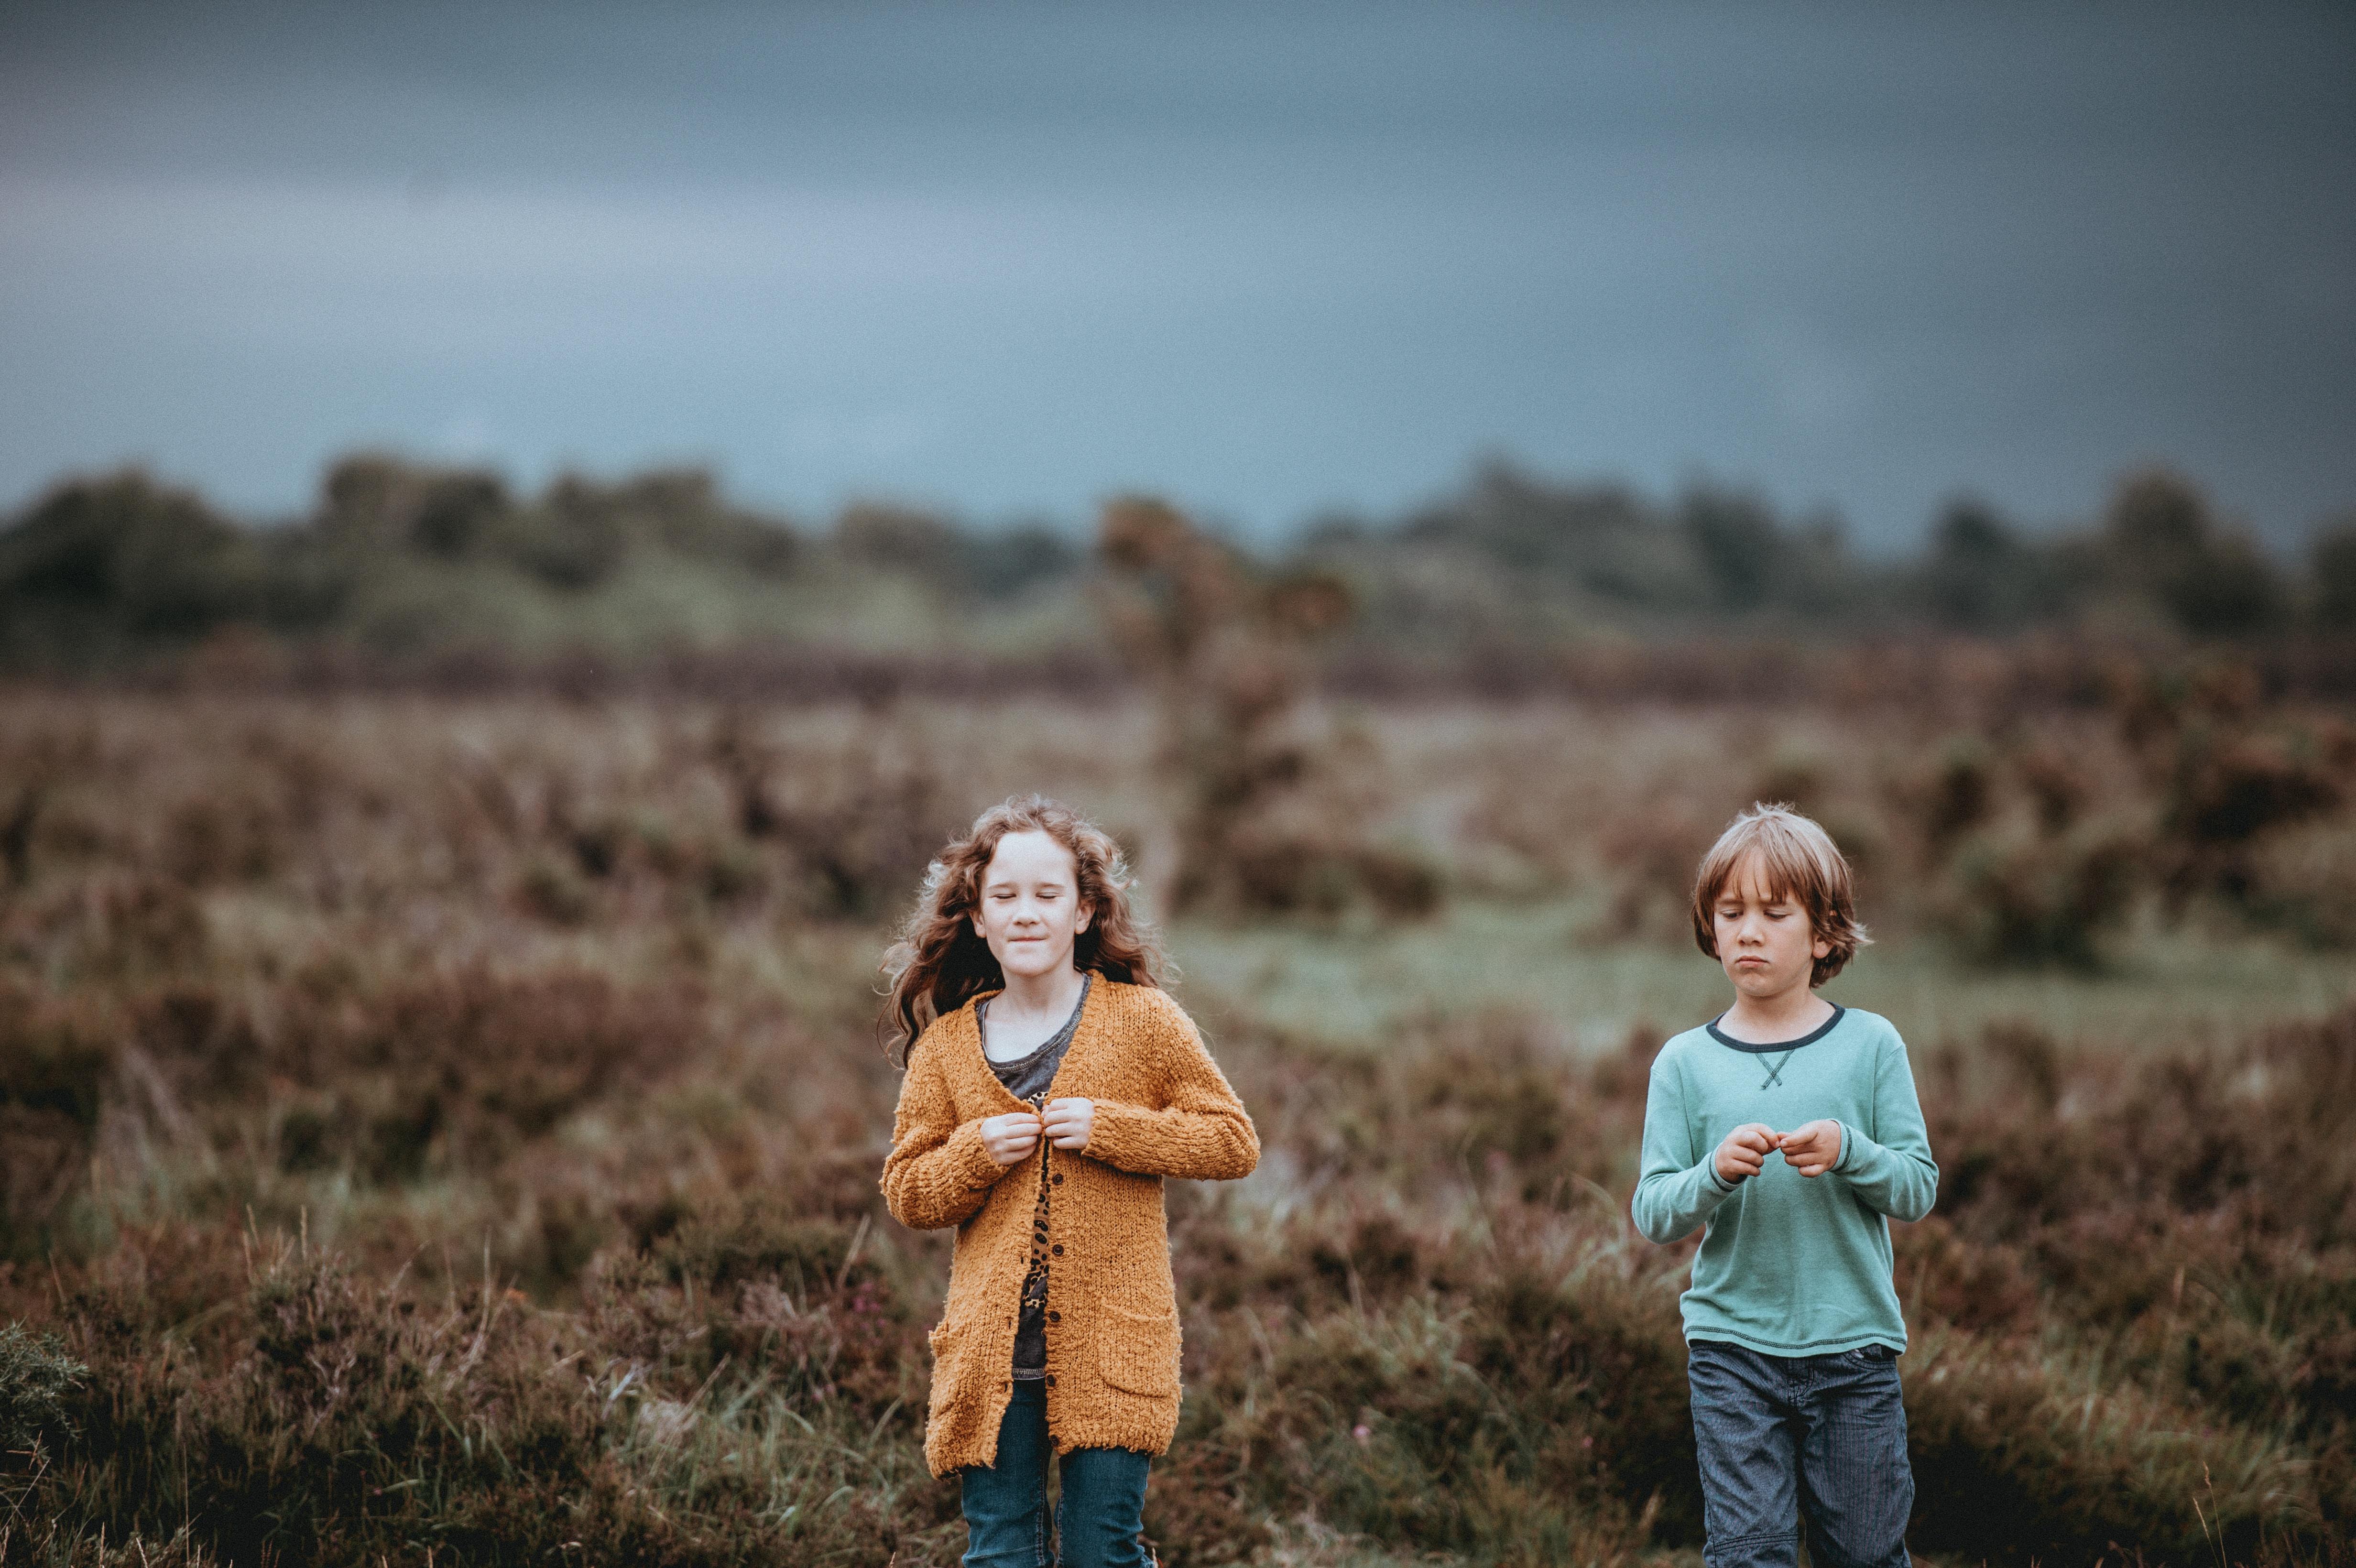 shallow focus photography of children walking